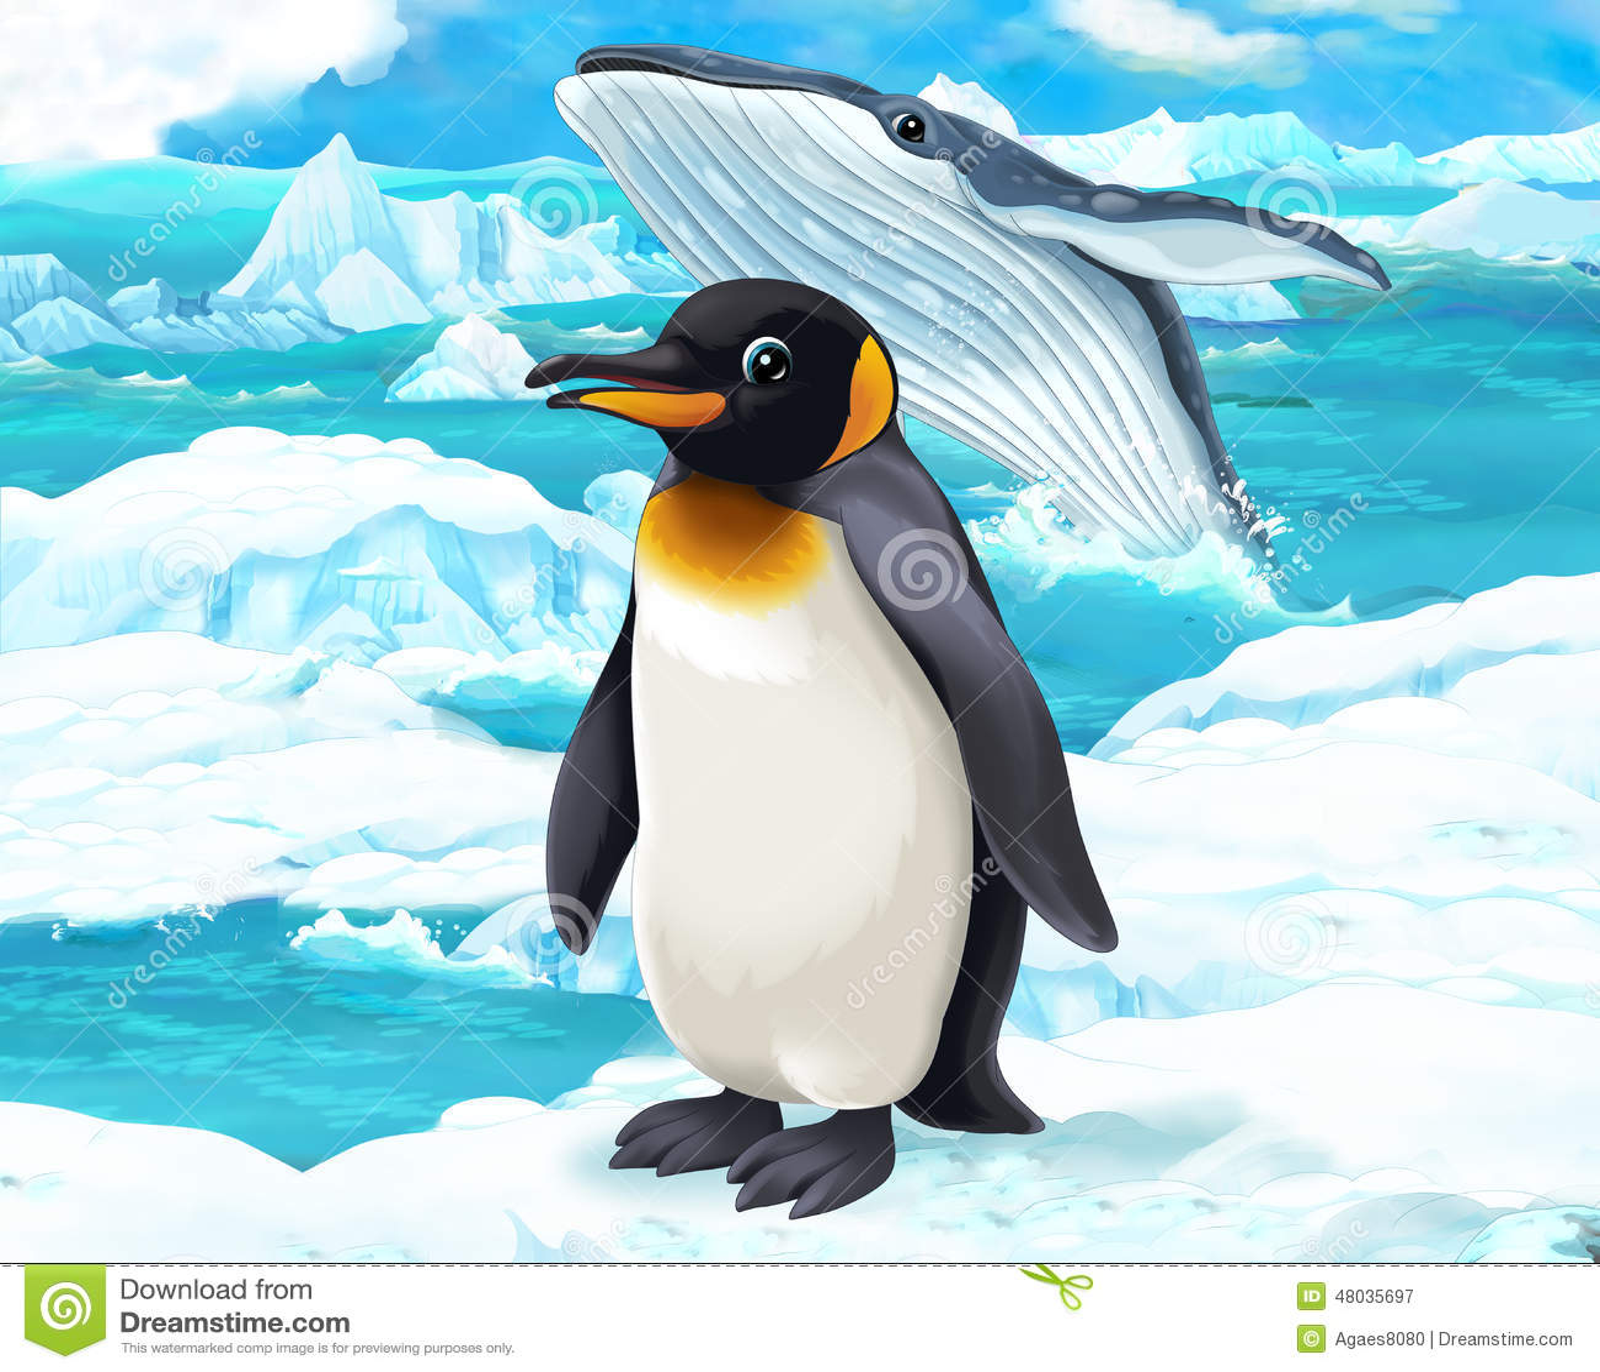 cartoon scene - arctic animals - penguin and whale stock illustration